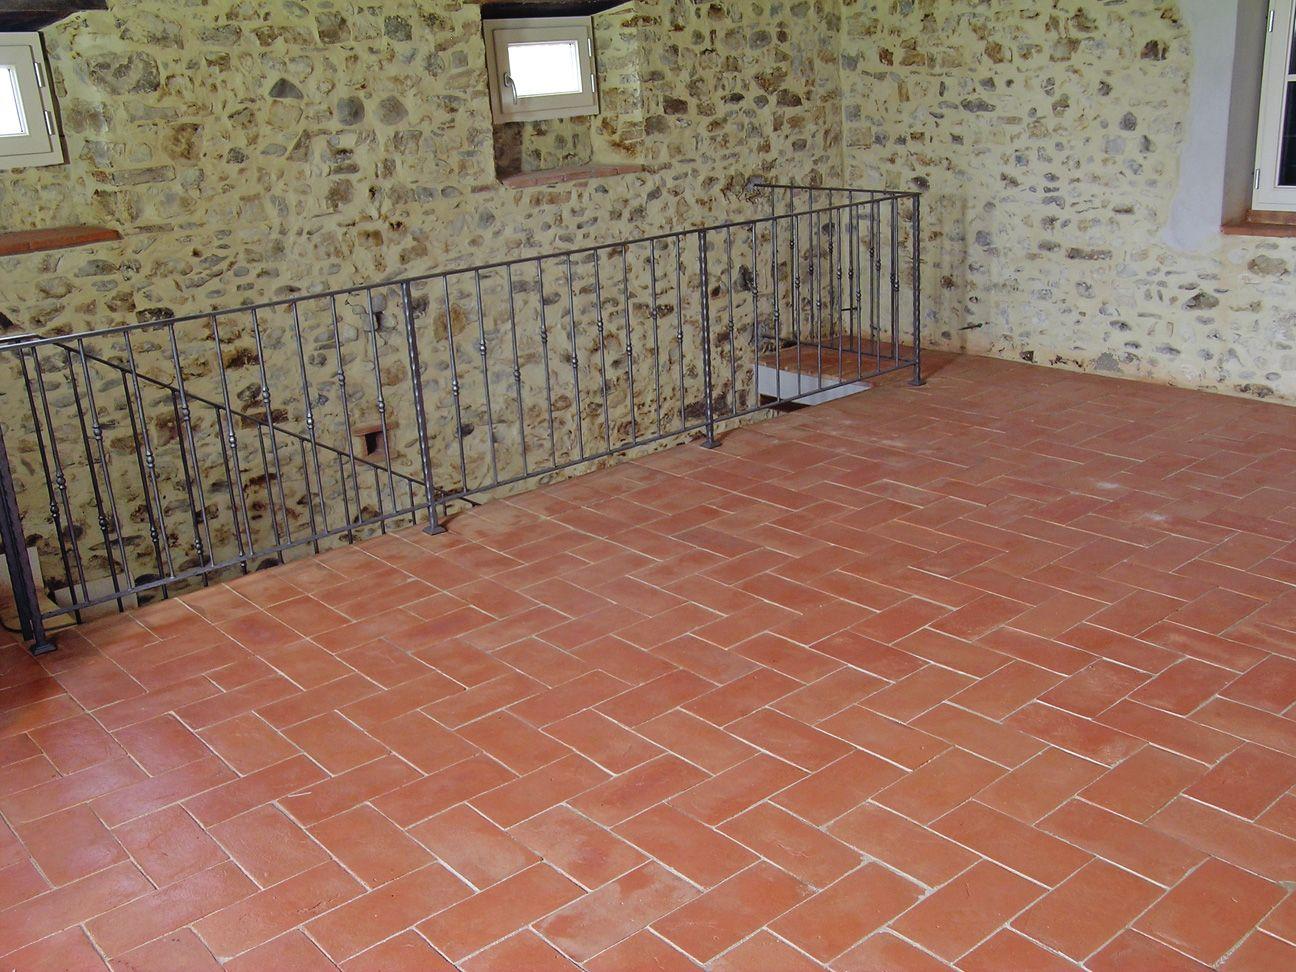 Pin By Lillian Huntington On Pis Terra Floor Design Terracotta Floor Tile Floor